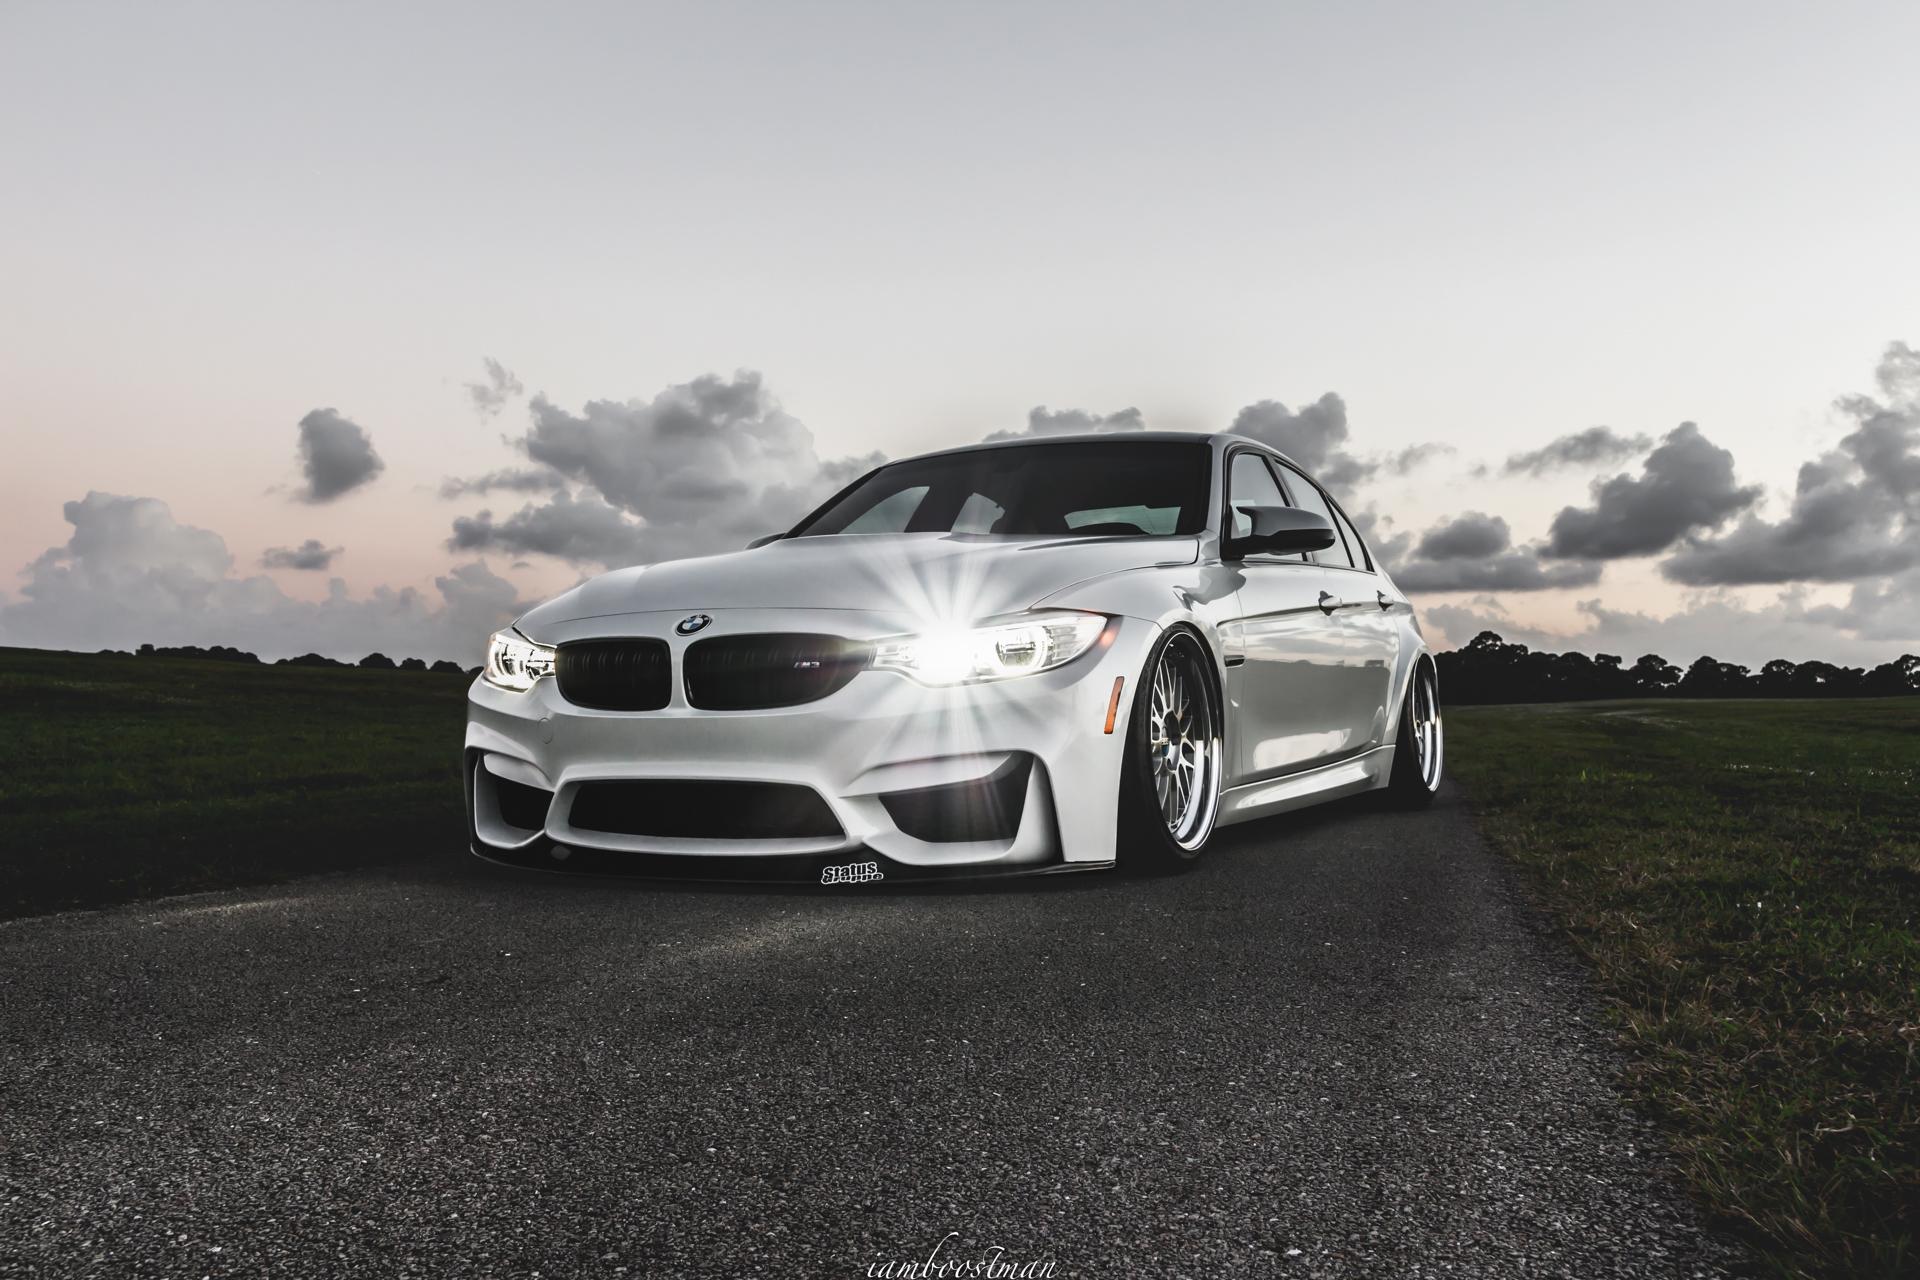 BMW F80 M3 BBS LM 05